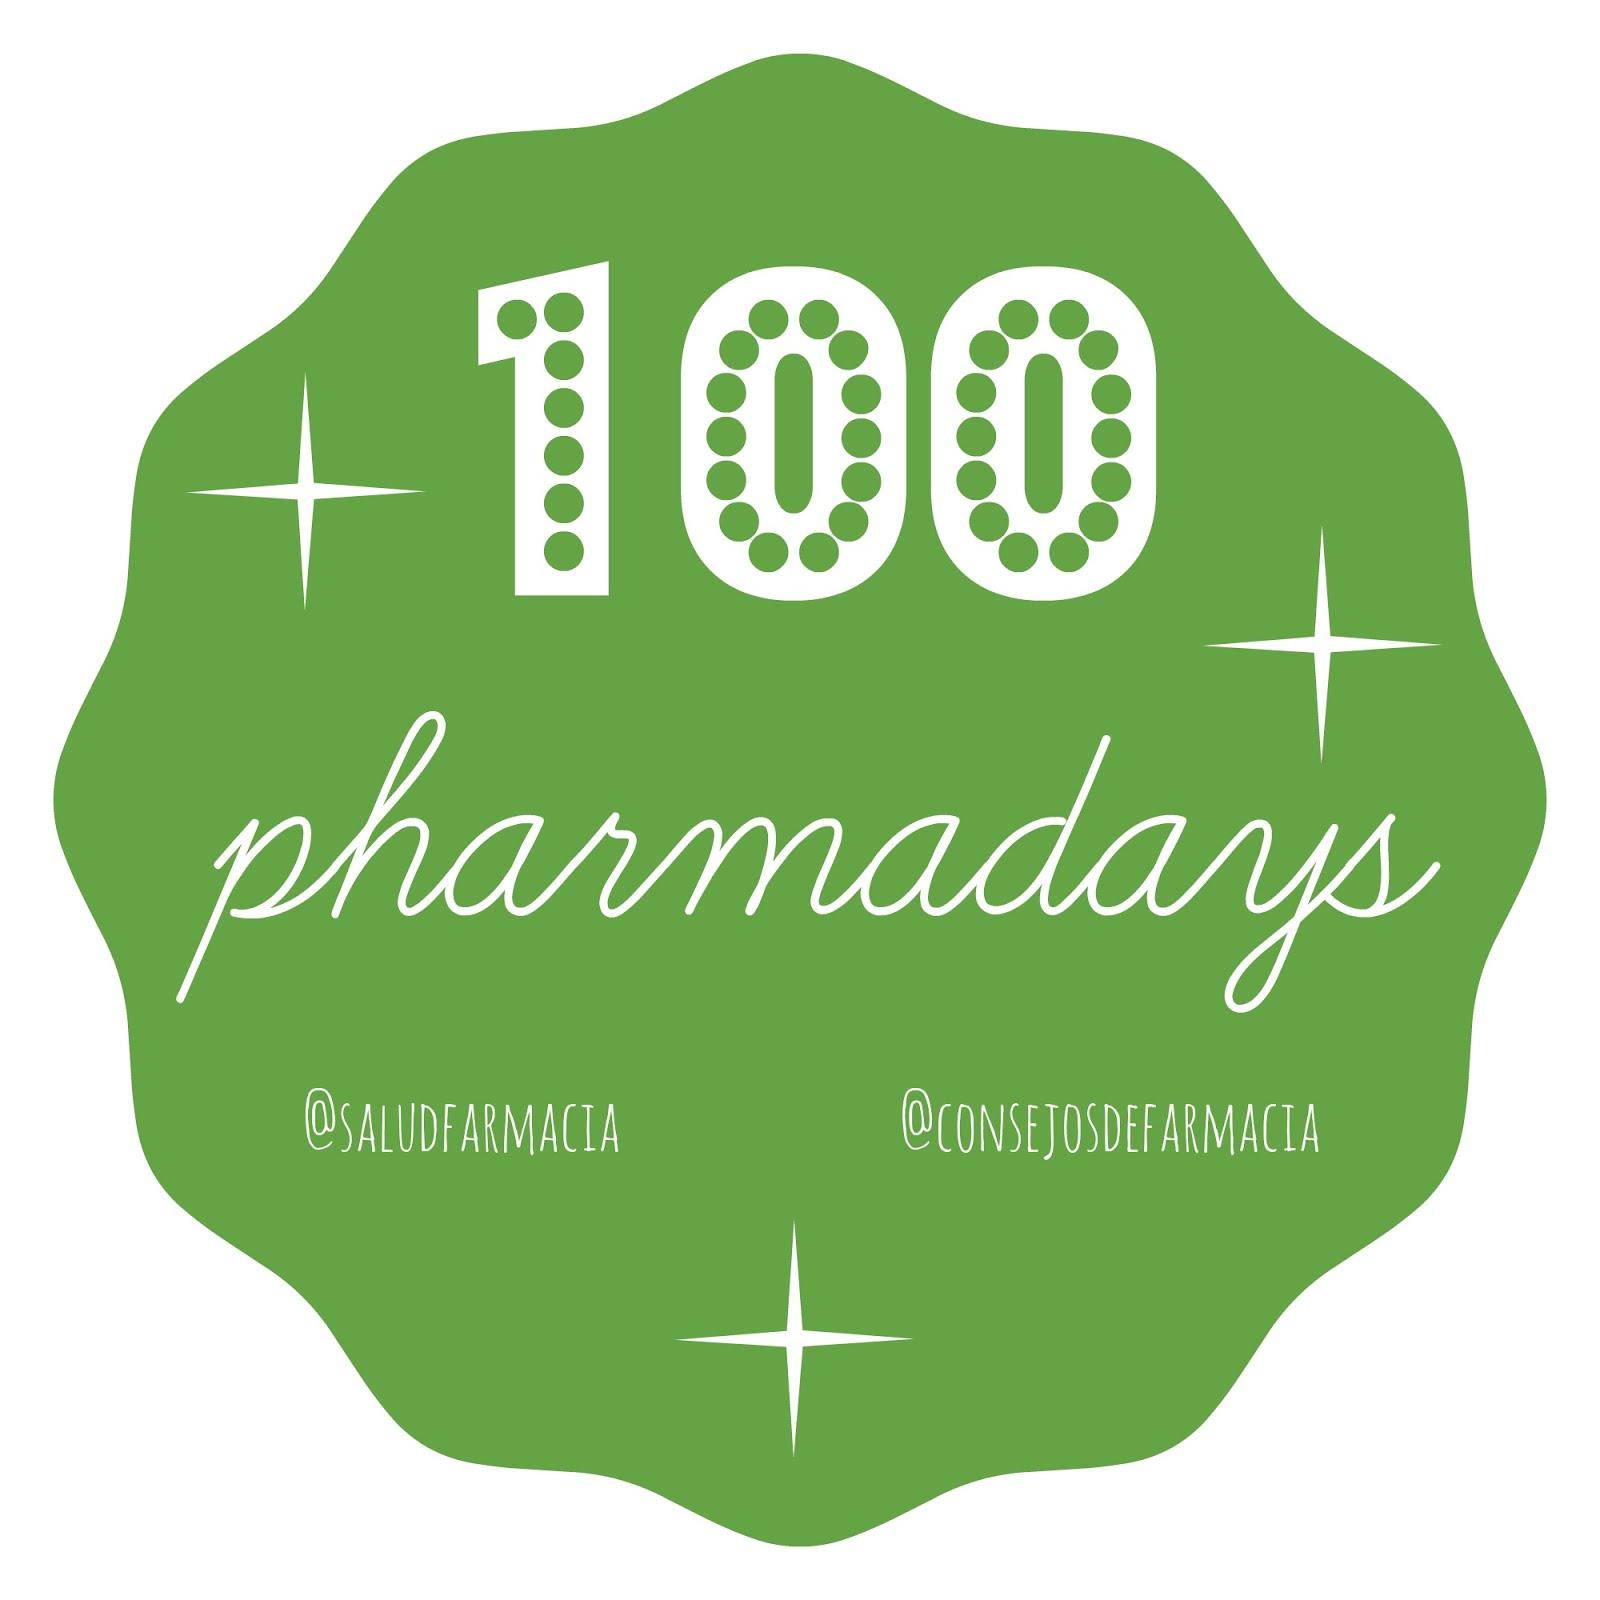 #100PharmaDays